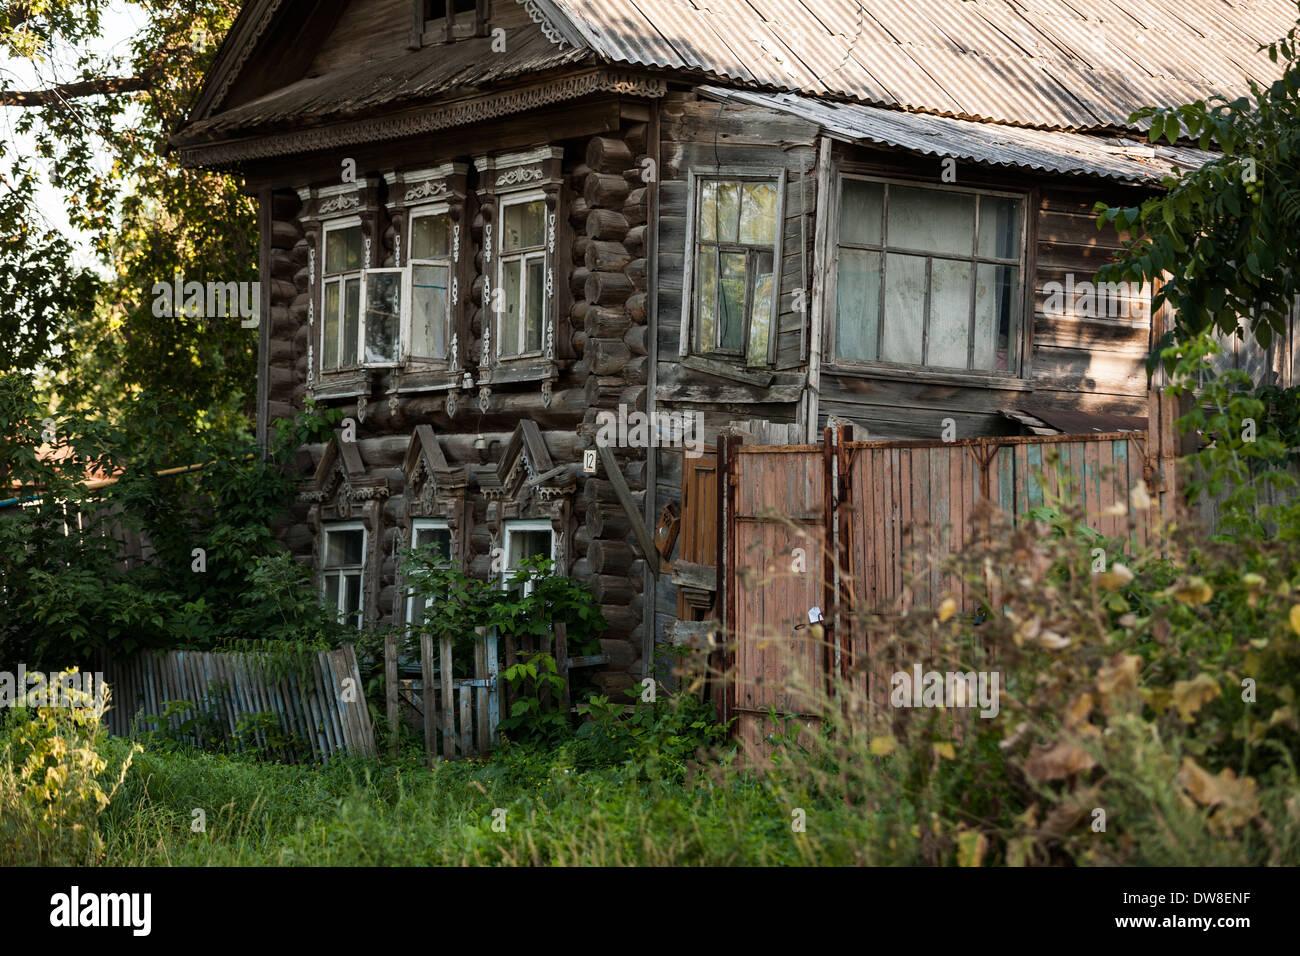 Traditional carved architecture in Kozmodemyansk, Mari El republic, Russia Stock Photo